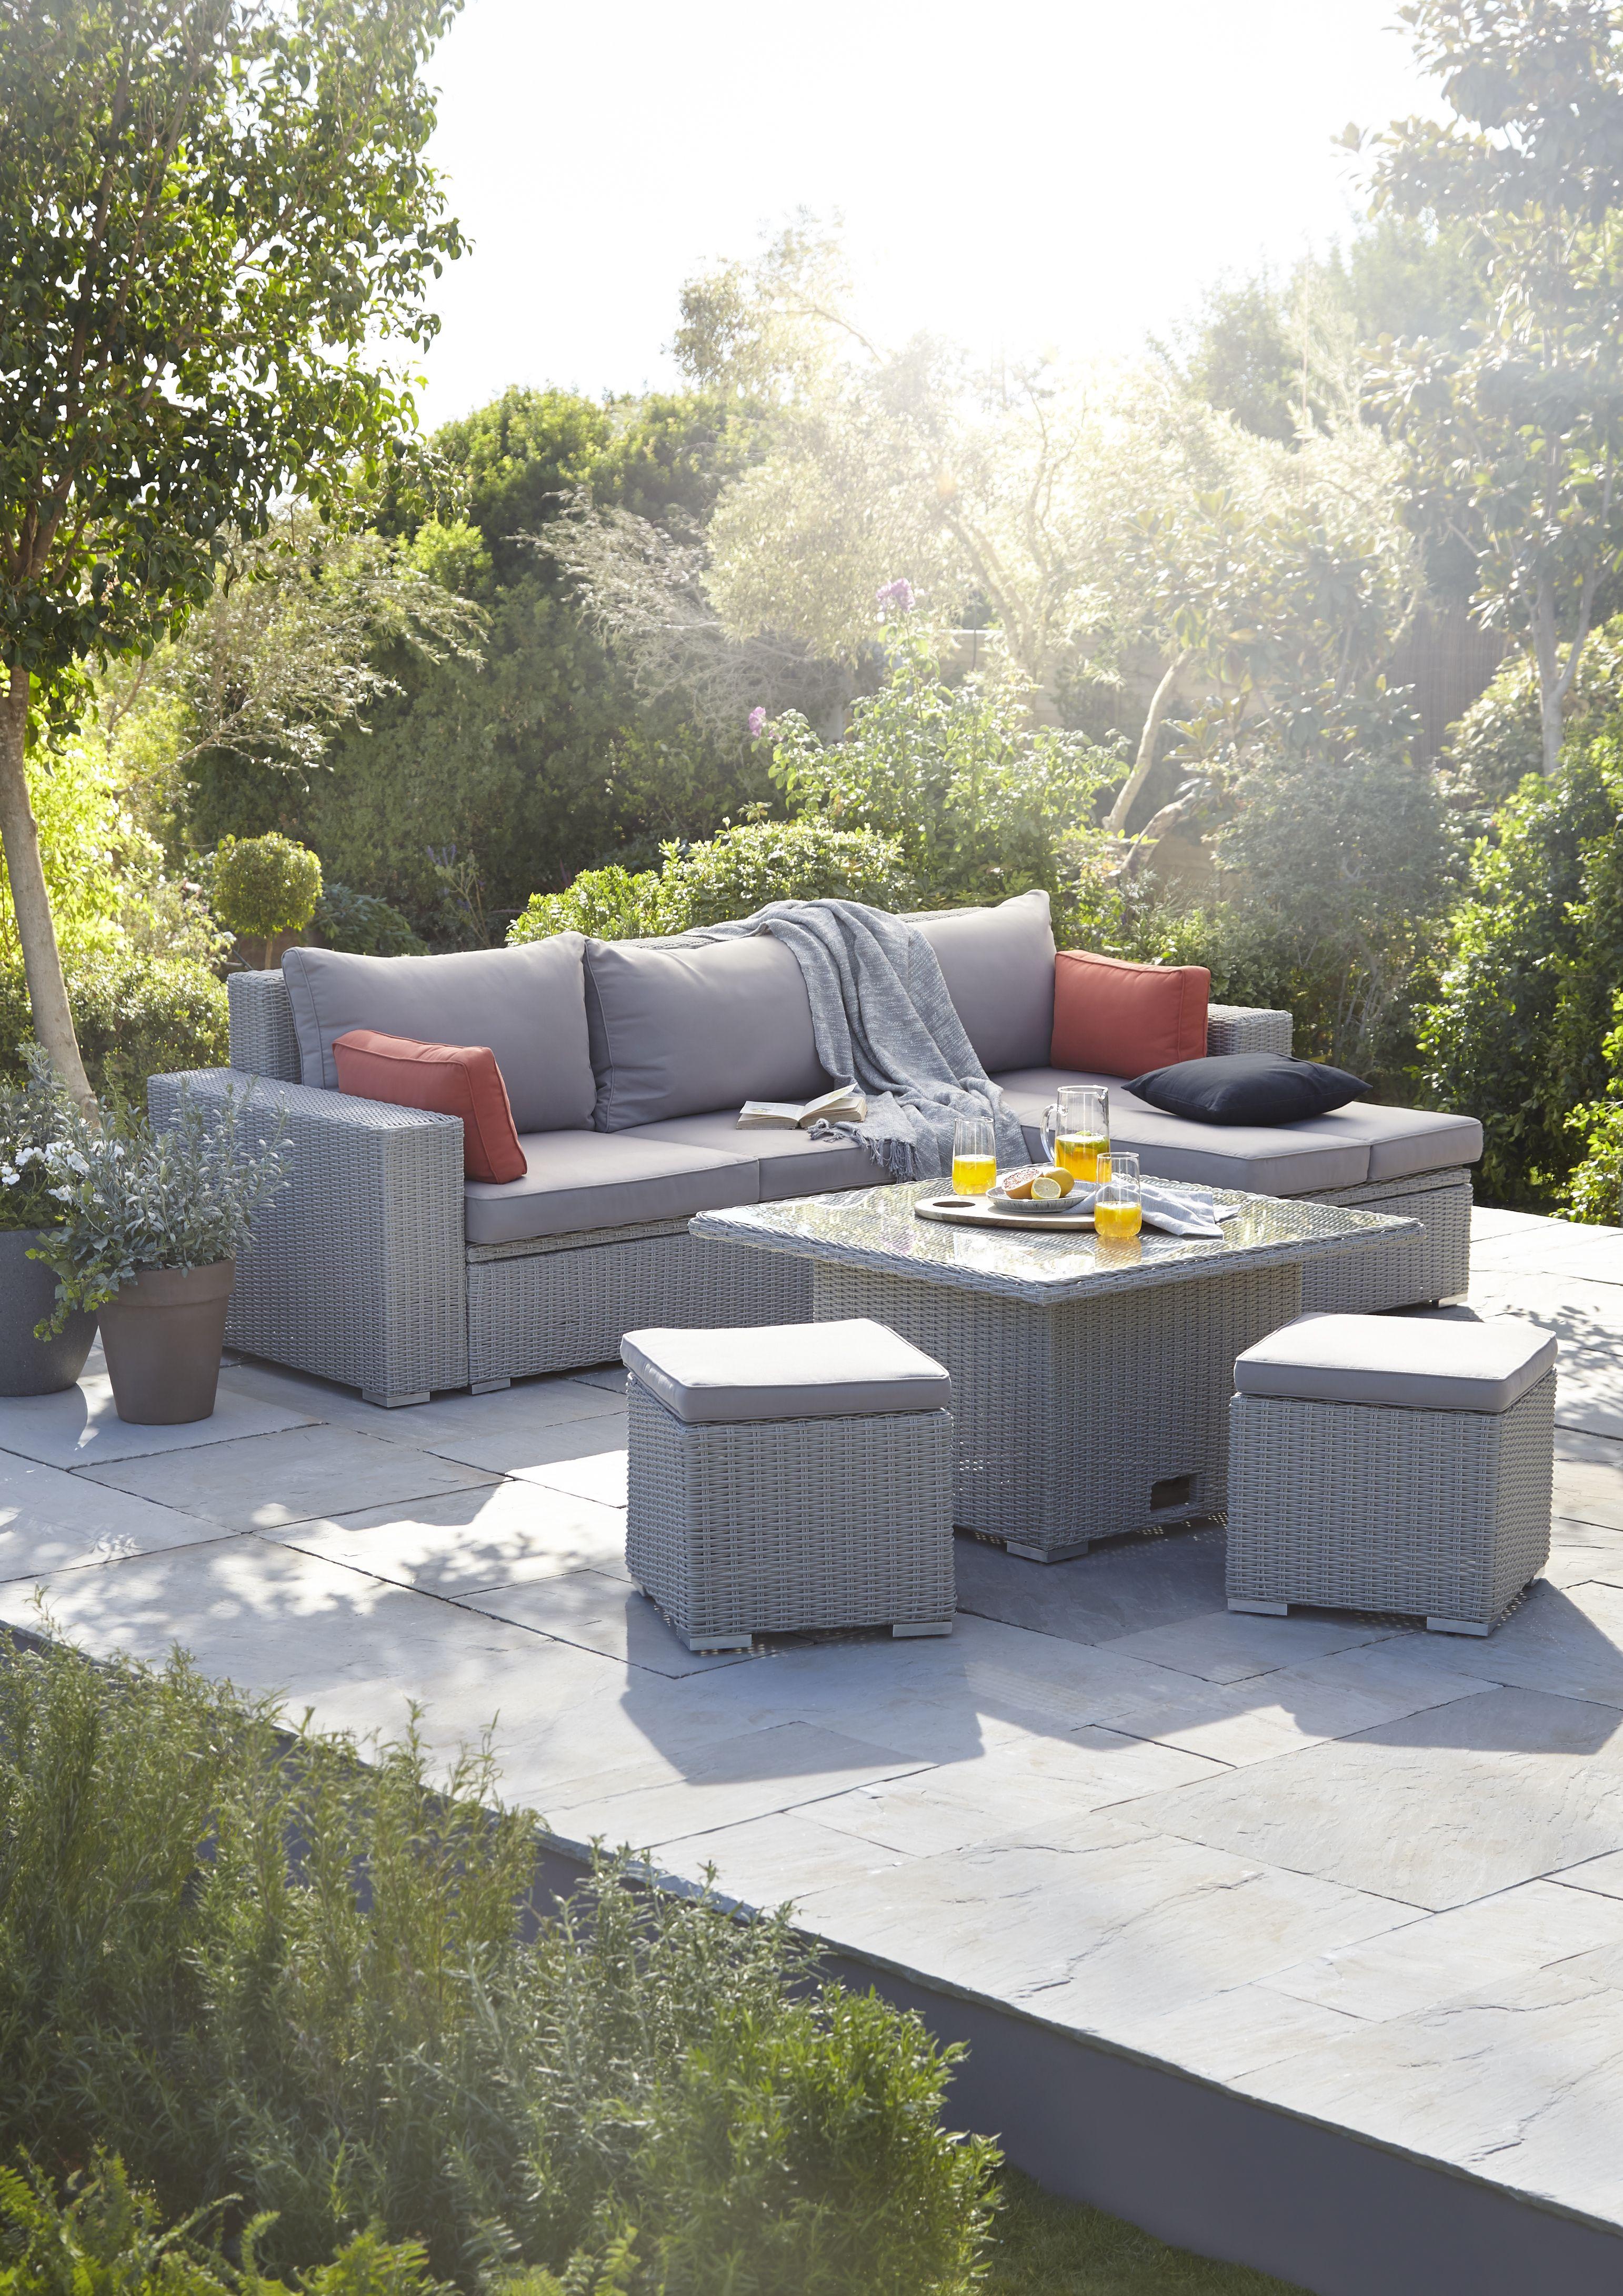 Zestaw Modulowych Mebli Ogrodowych Gabbs Modulowe In 2021 Outdoor Decor Outdoor Sectional Home Decor